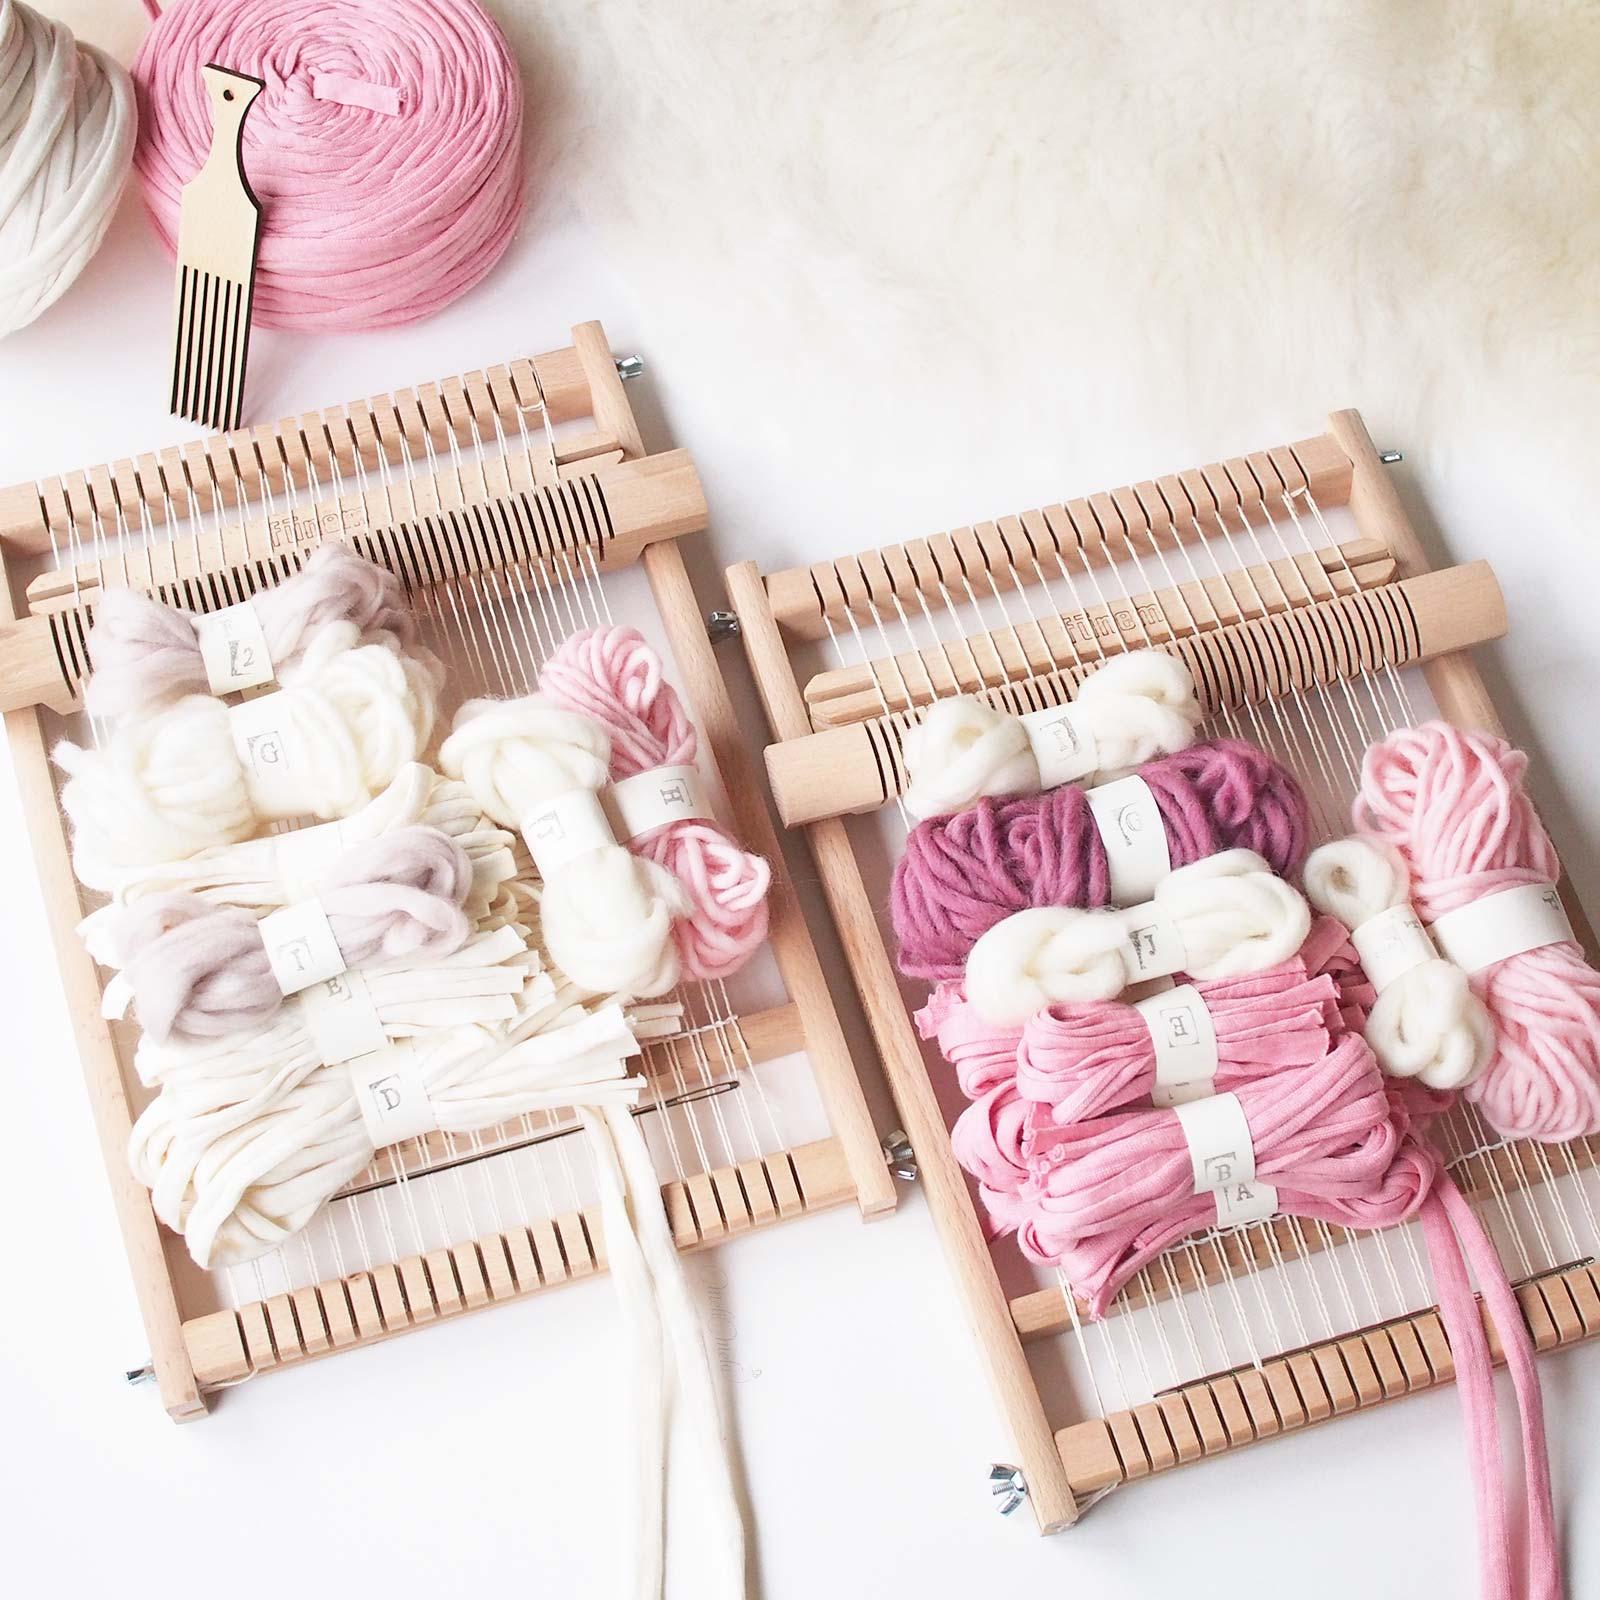 kit de tissage DIY couleurs rose woolandthegang weareknitters funemstudio laboutiquedemelimelo